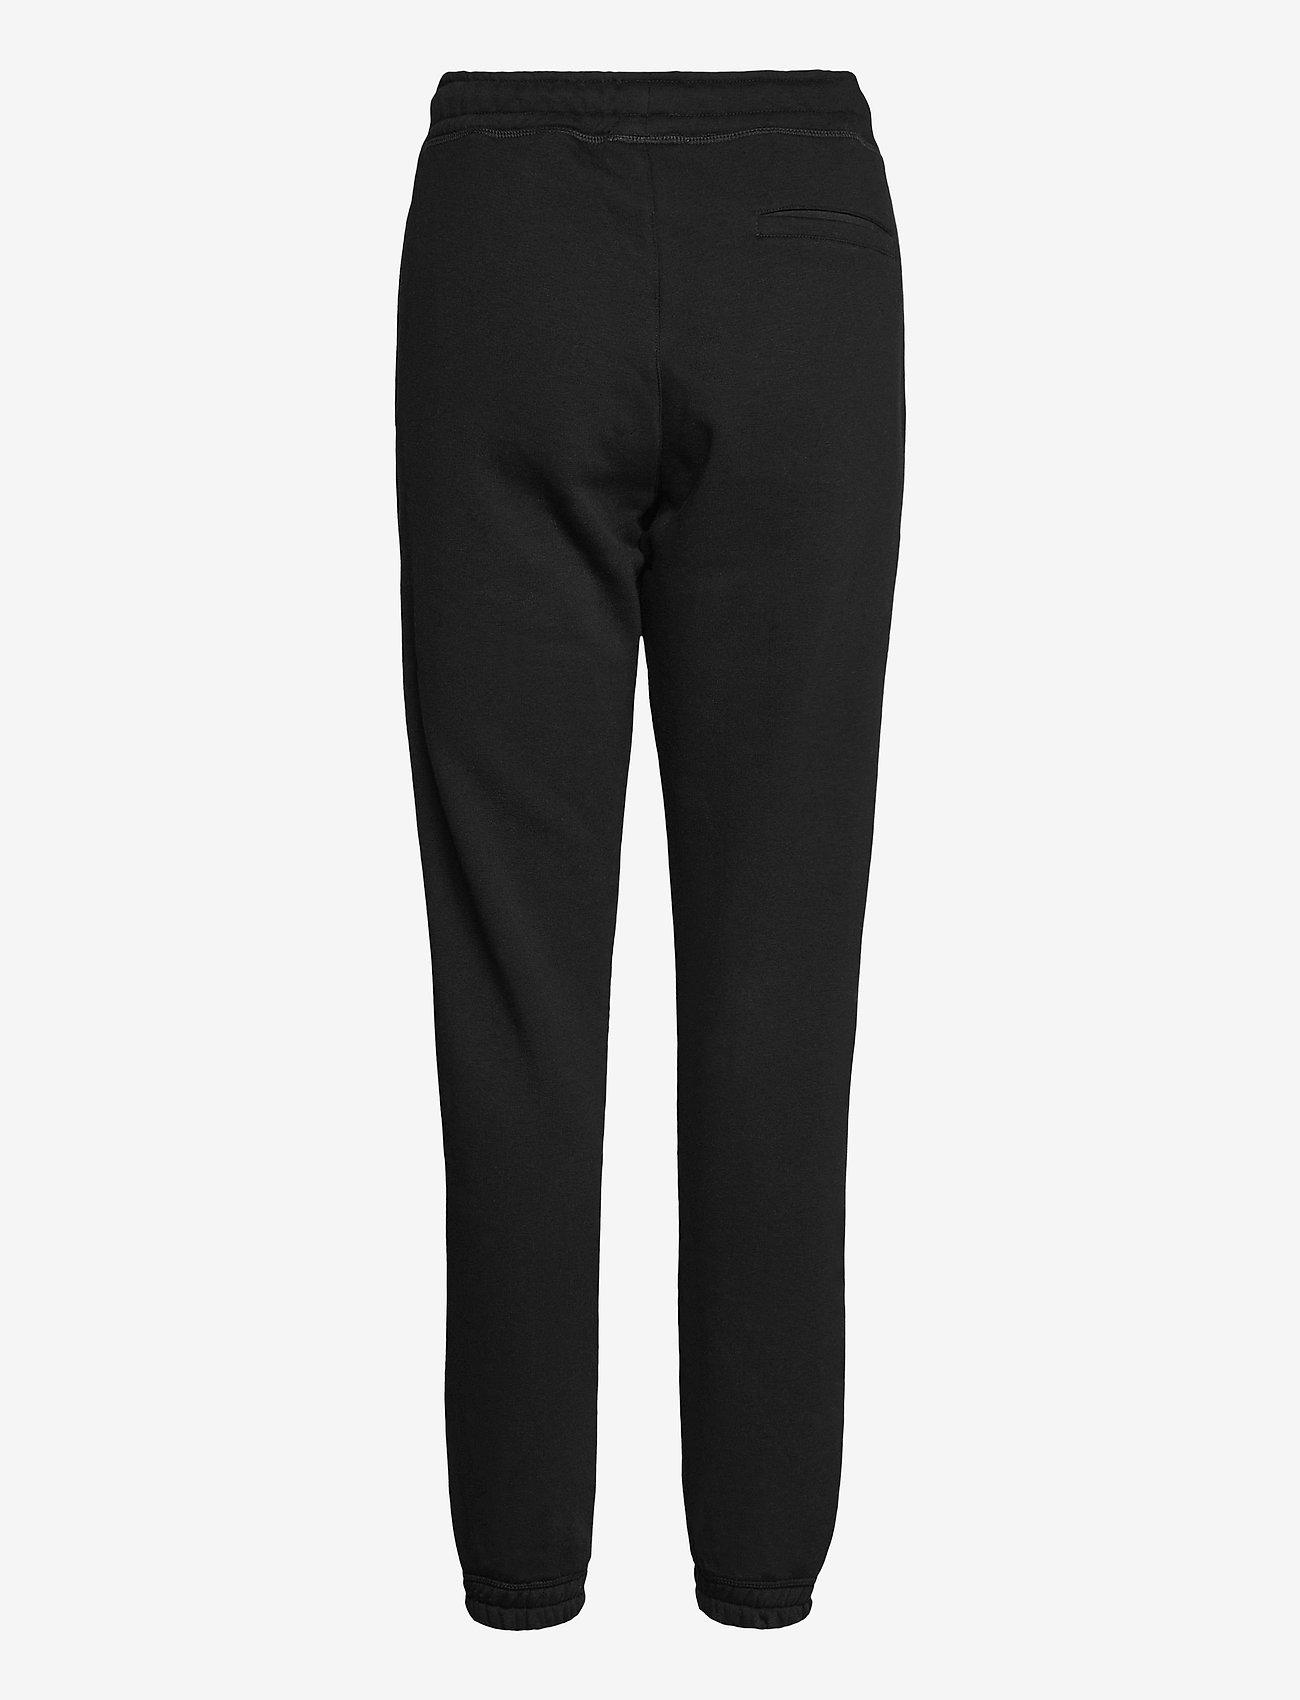 Soulland - Eisa pants - kleidung - black - 1